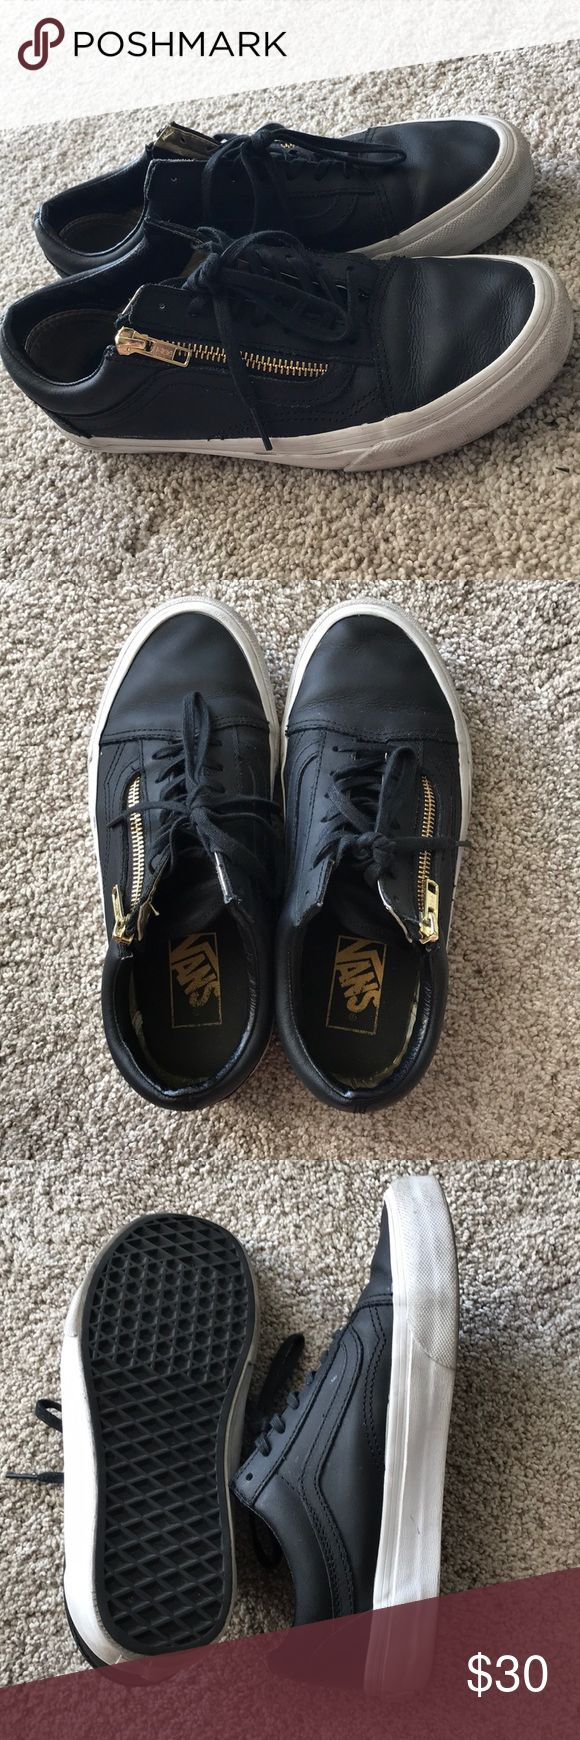 Leather Vans Slightly used black leather old school vans. Make an offer no trades Vans Shoes Sneakers